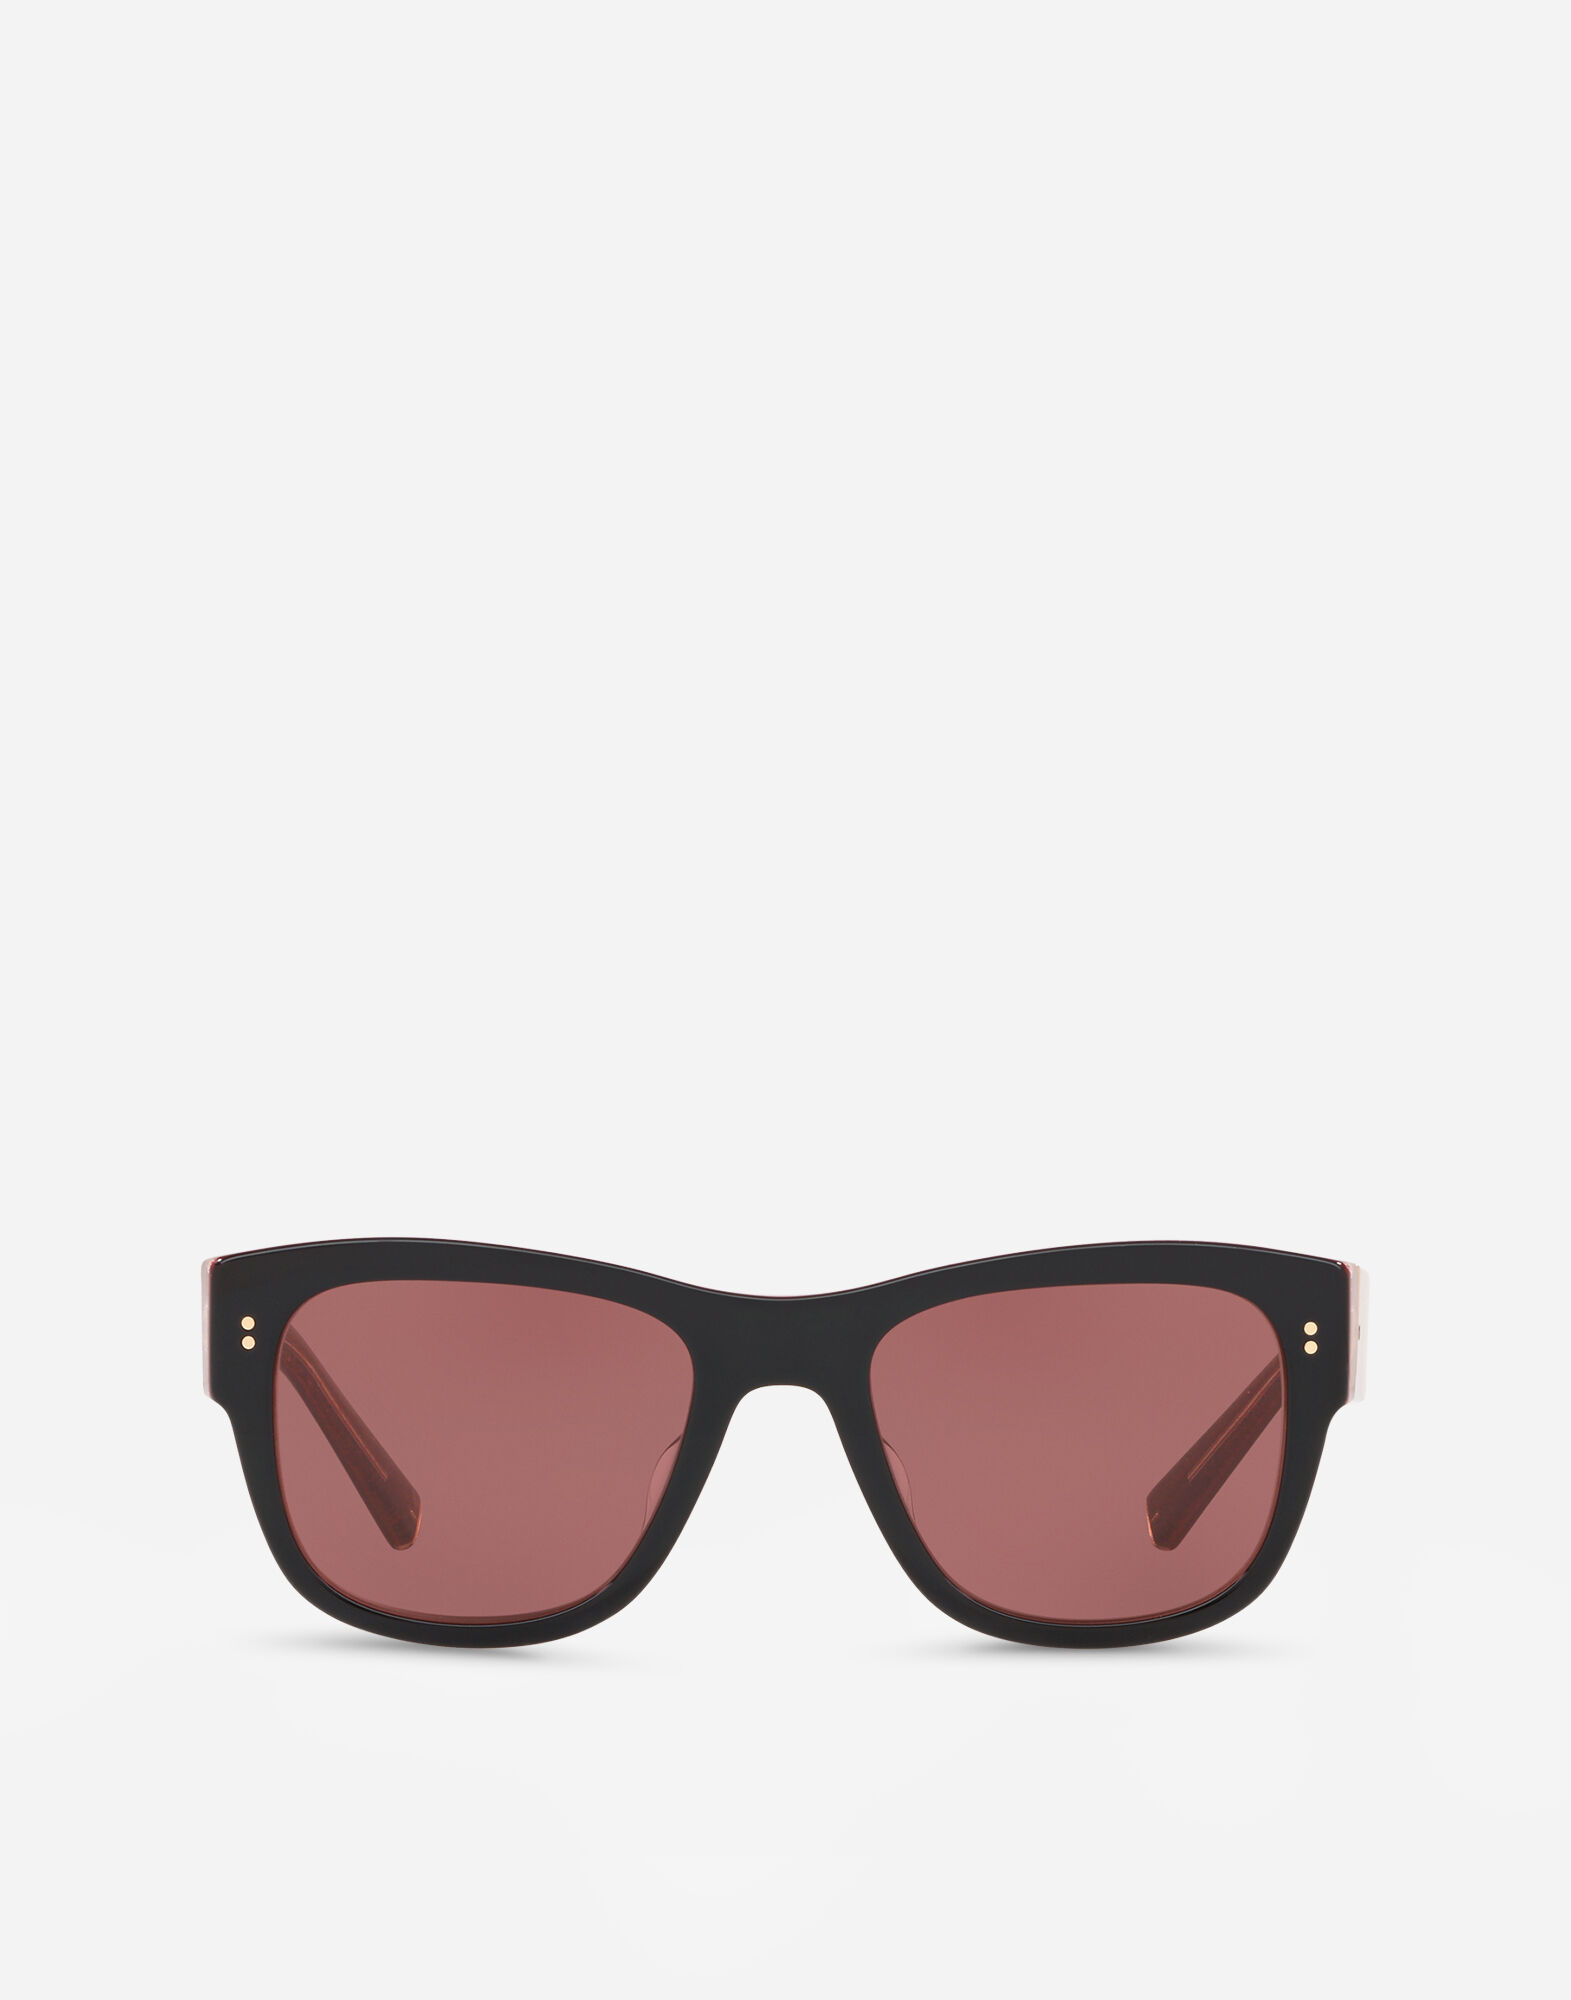 De amp;gabbana HombreDolce Sol Gafas Gafas De UzSpMV